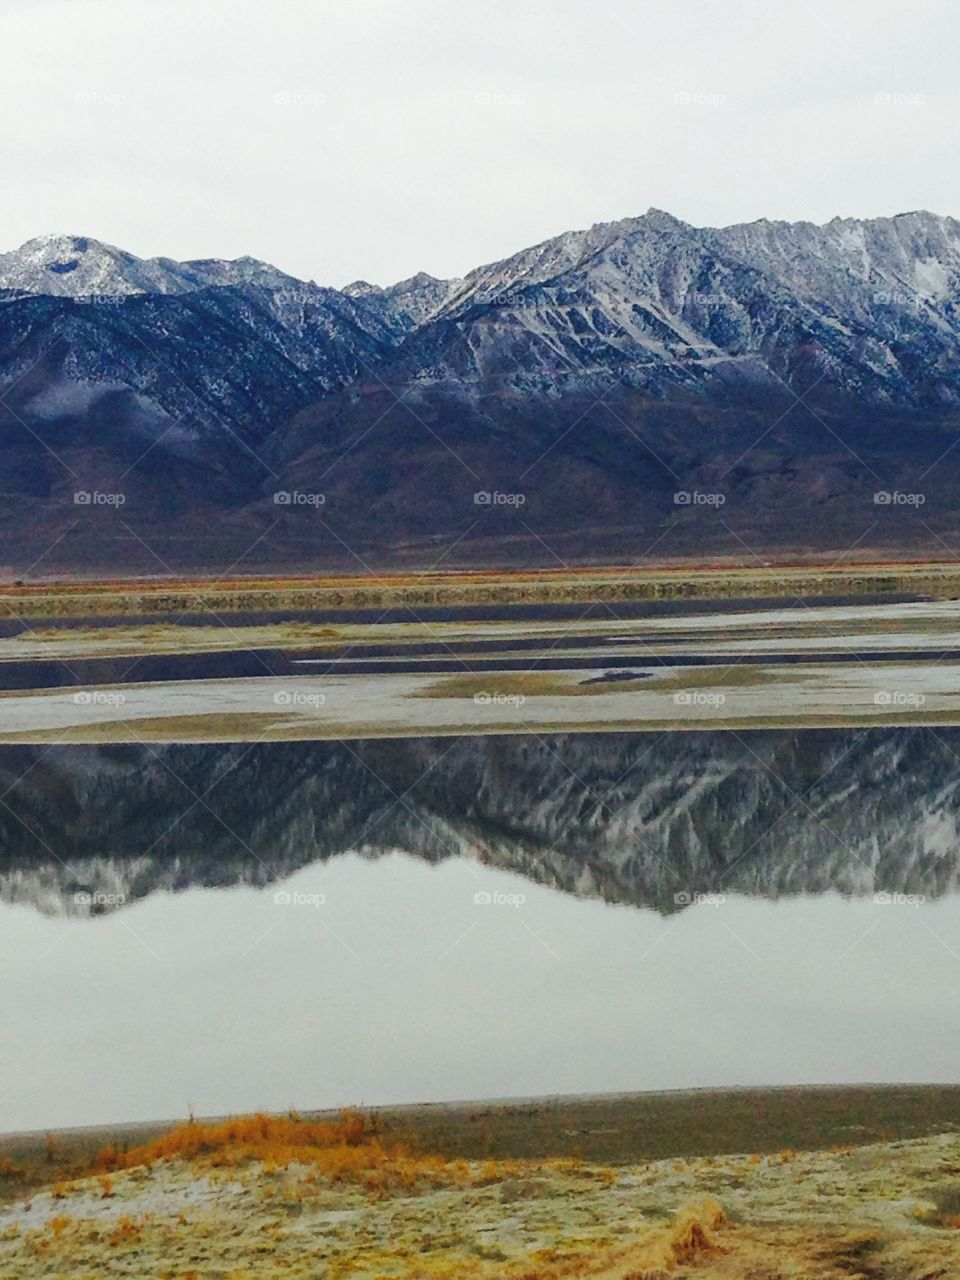 Restoring the dry lake